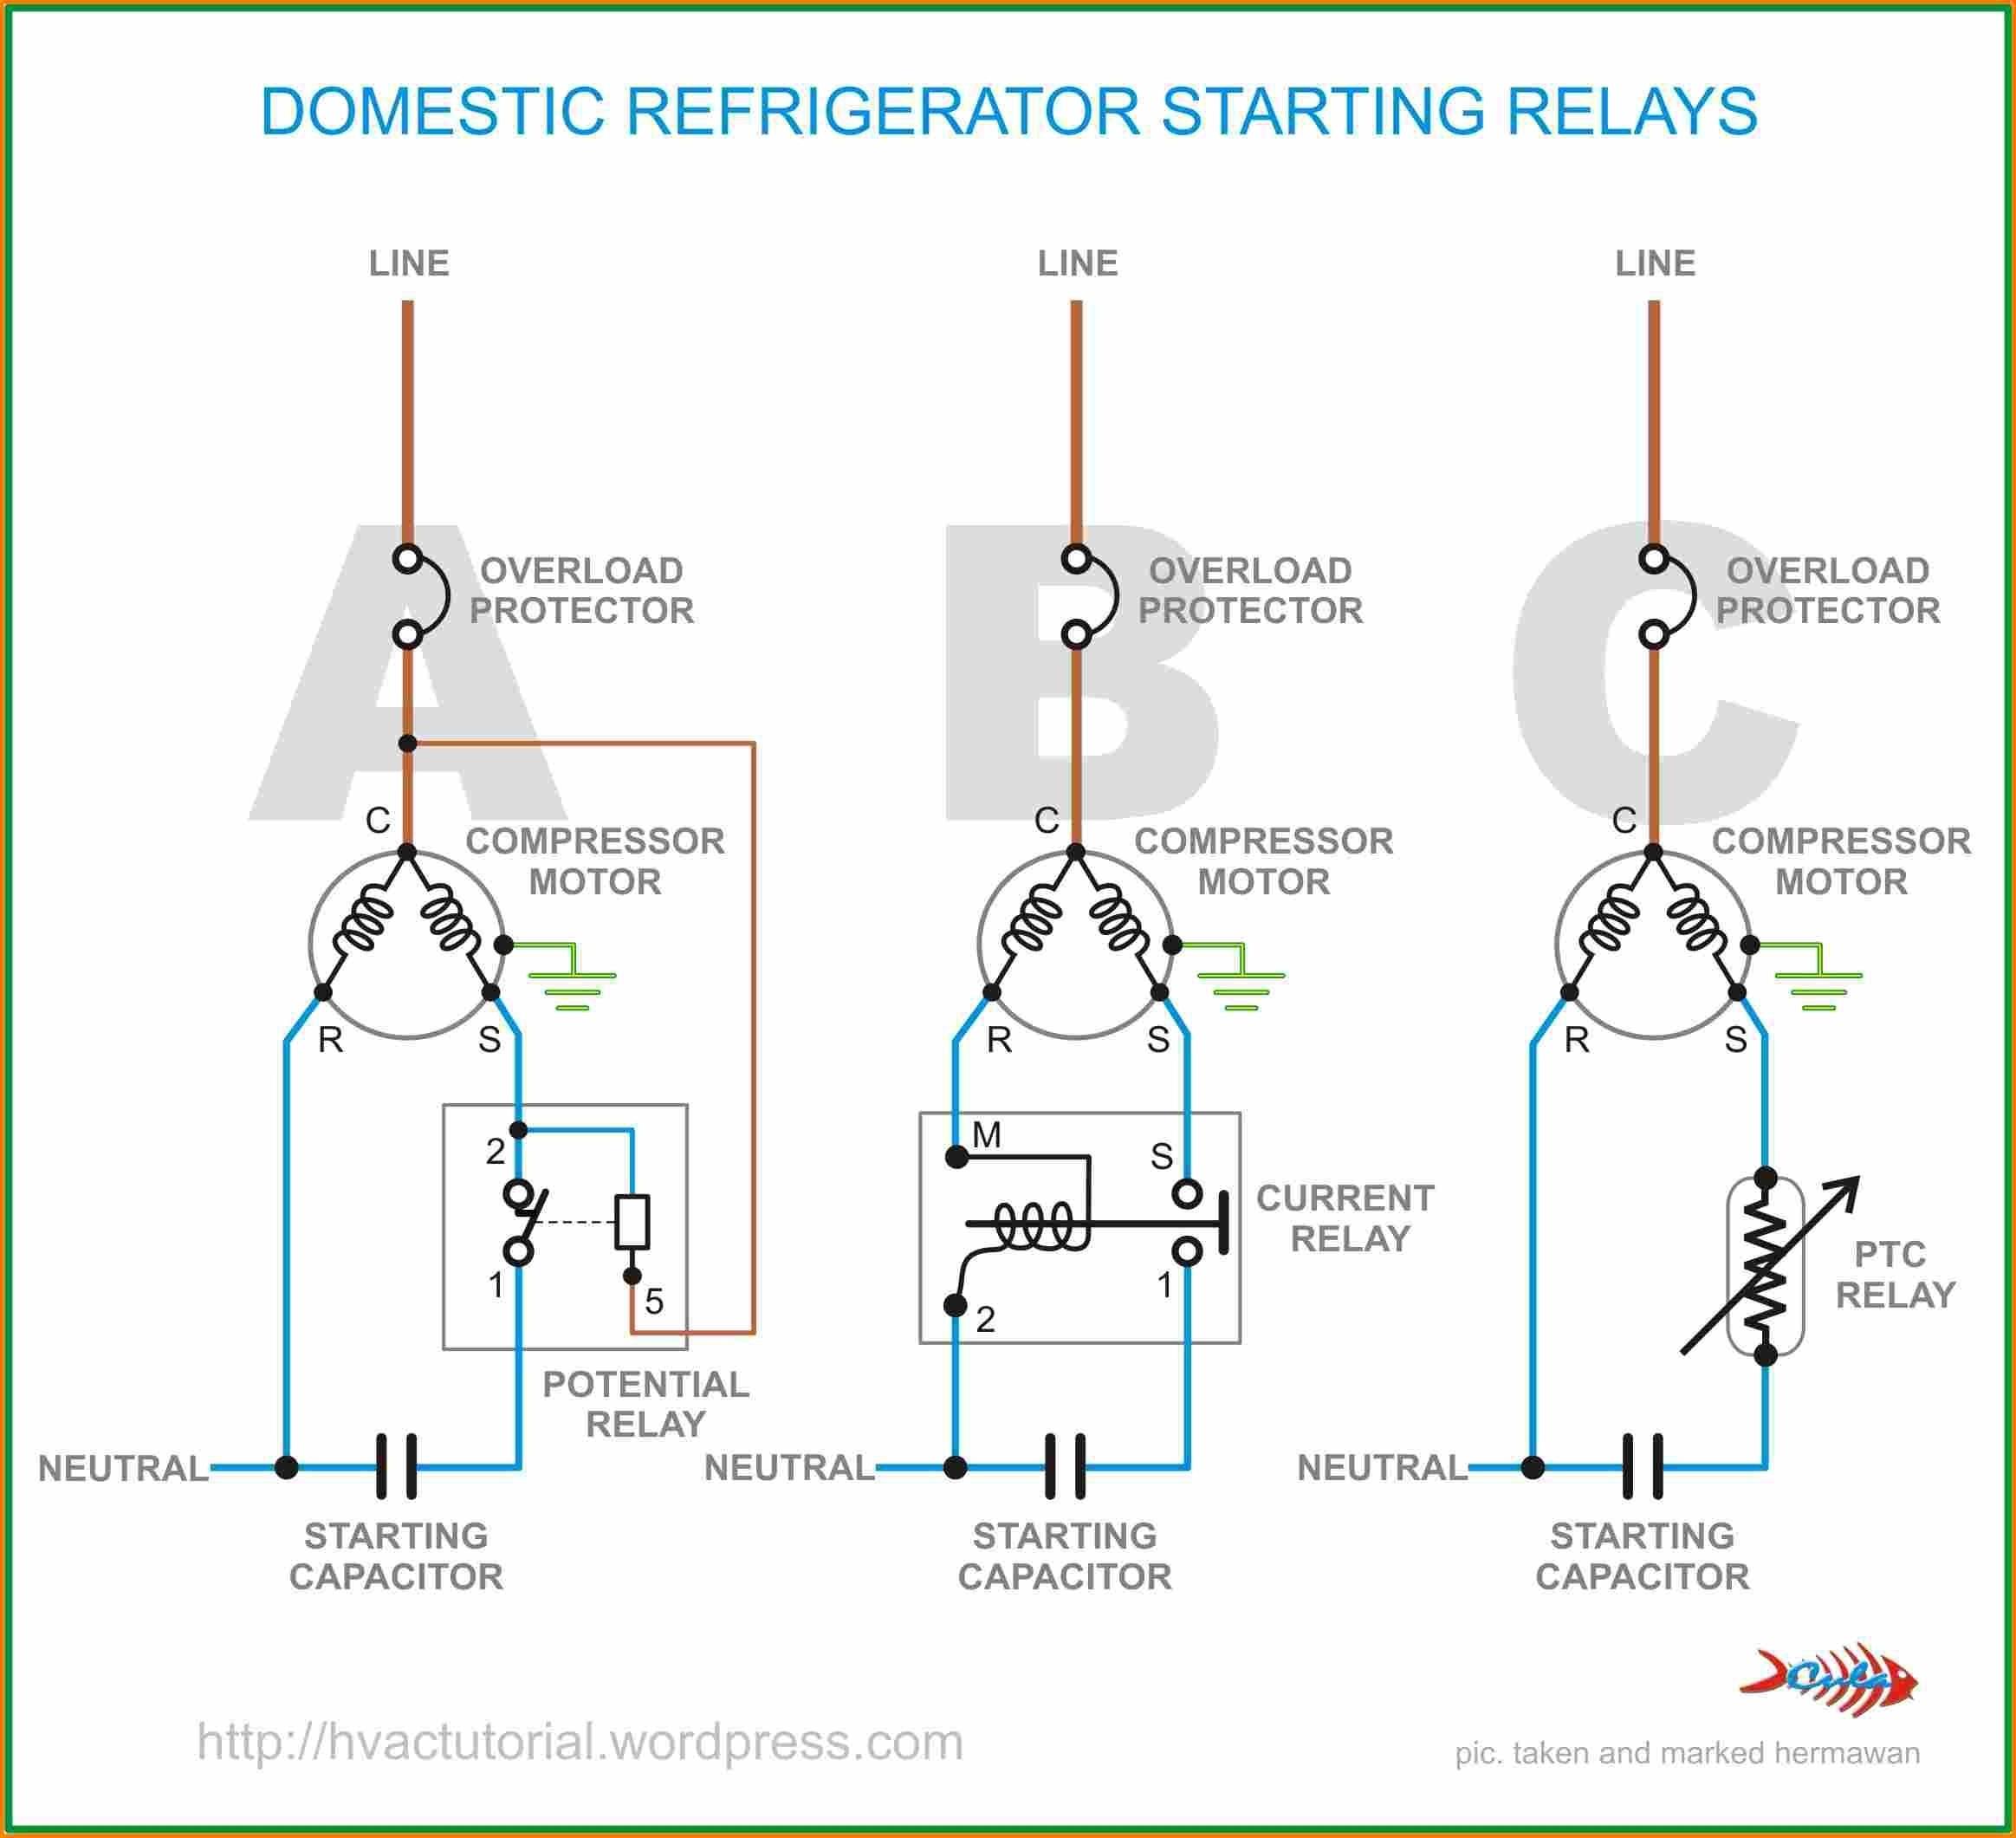 klixon motor protector wiring diagram Download-Wiring Diagram Detail Name klixon motor protector 17-s